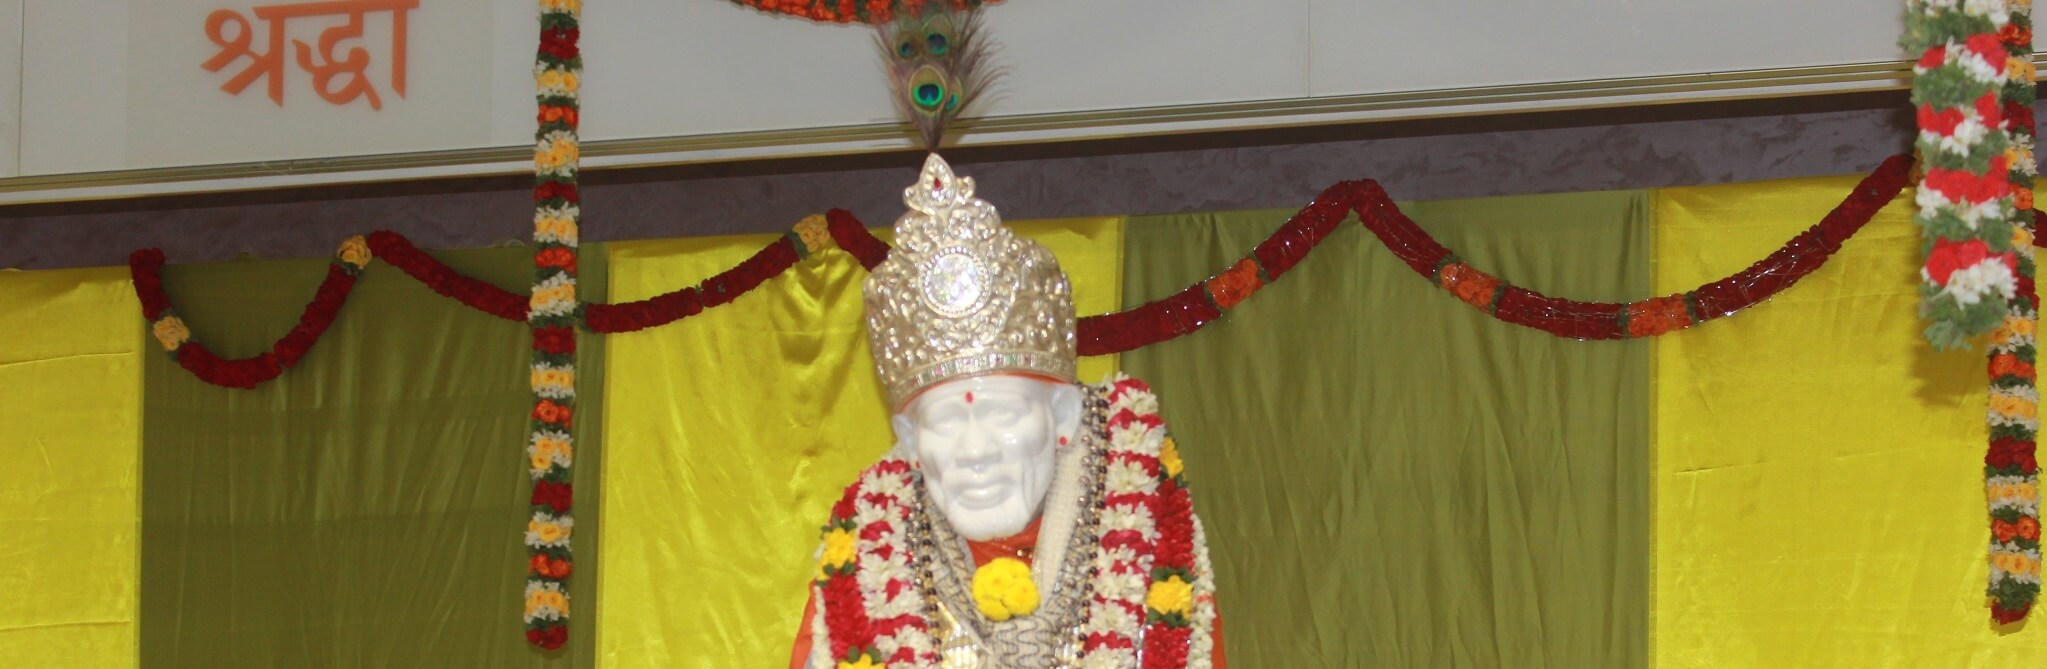 Shirdi Sai Baba Temples in Bangalore, India - Sri Datta Sai